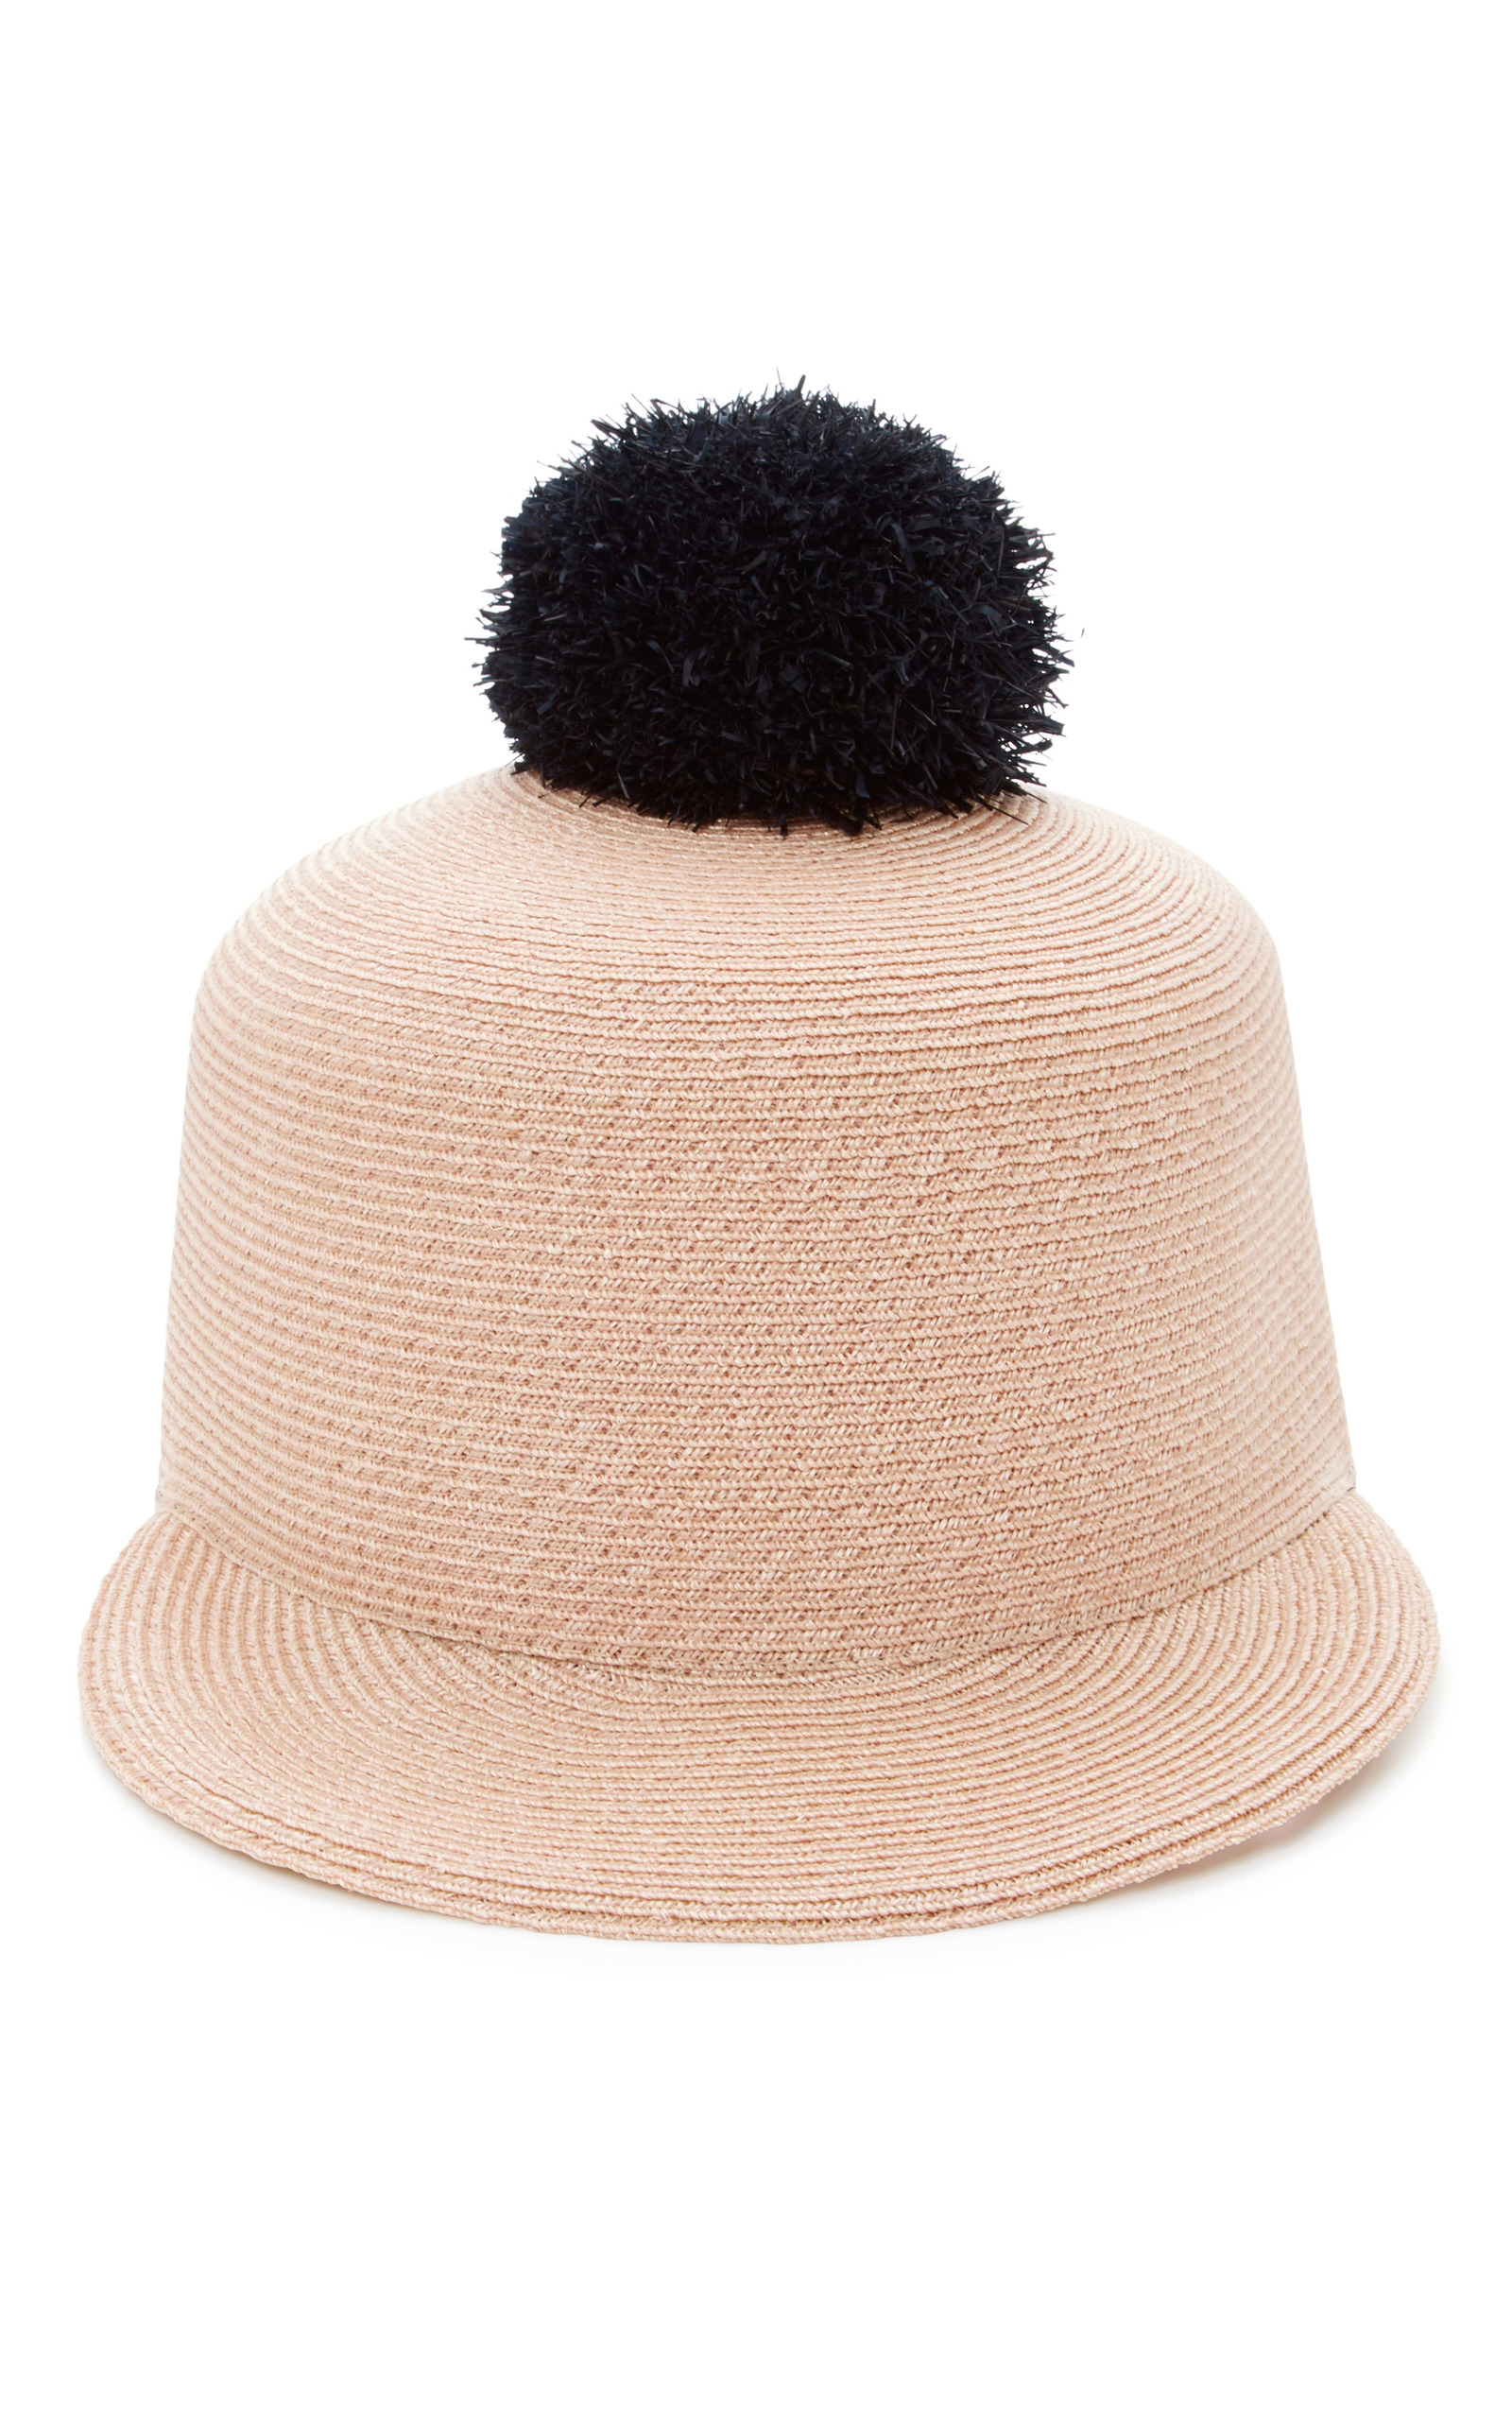 Loulou Pompom-Embellished Woven Hat